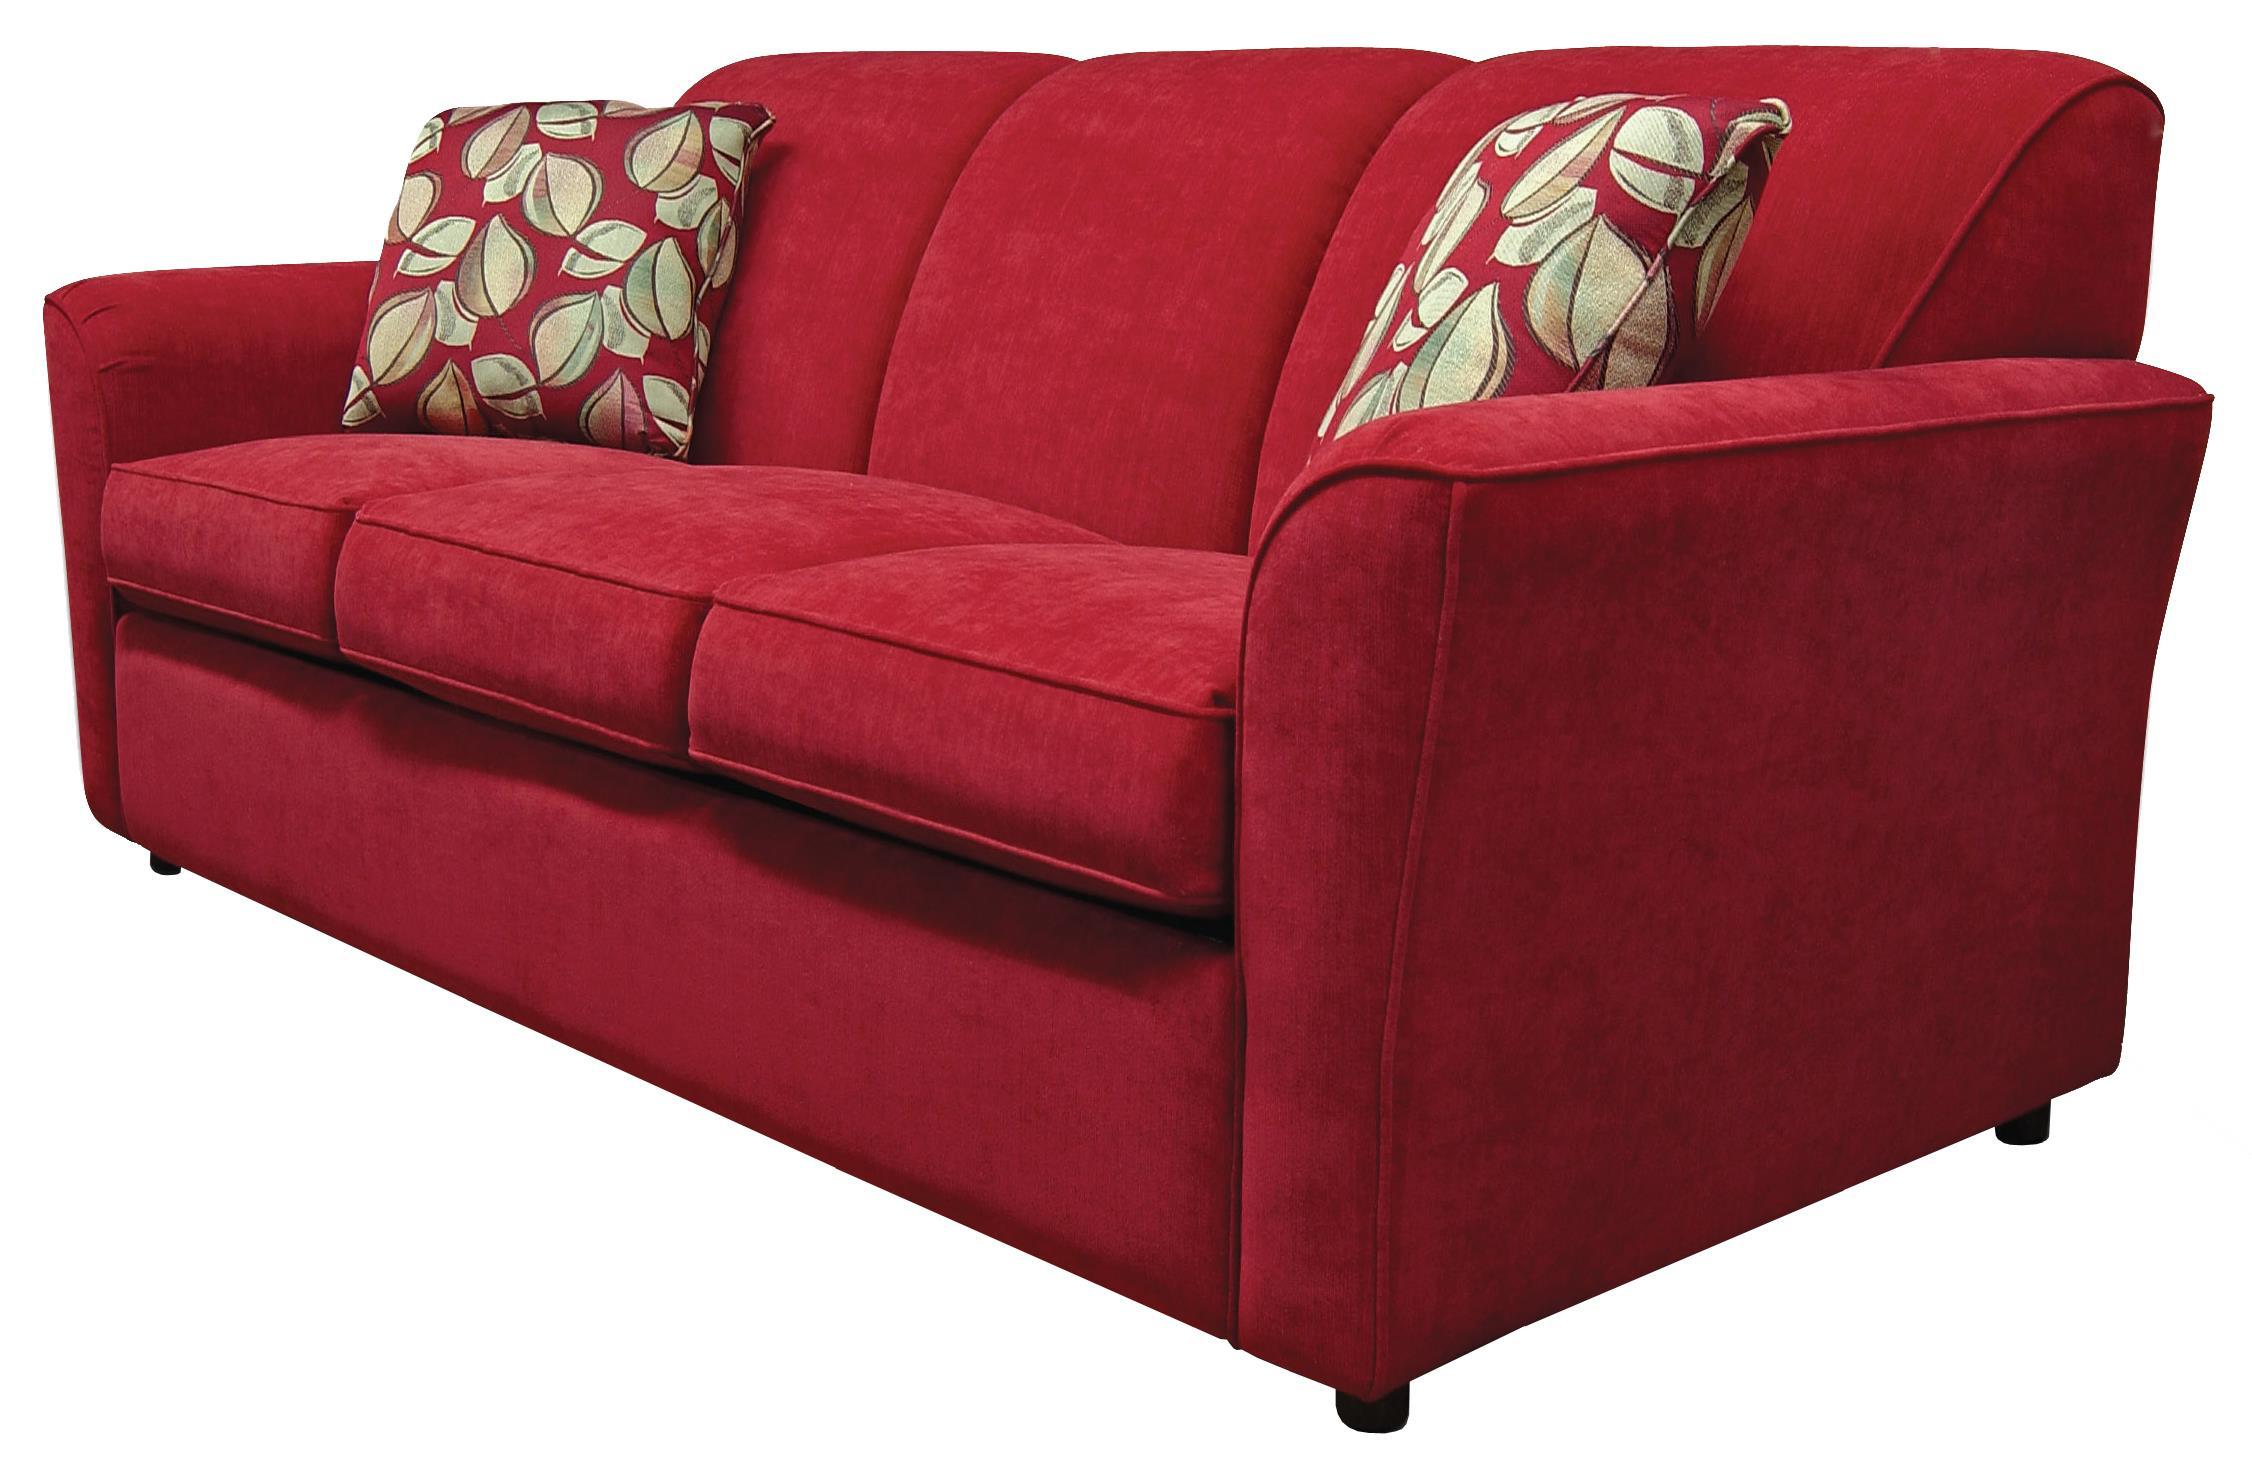 England Smyrna Queen Size Sleeper Sofa with Visco Mattress ...